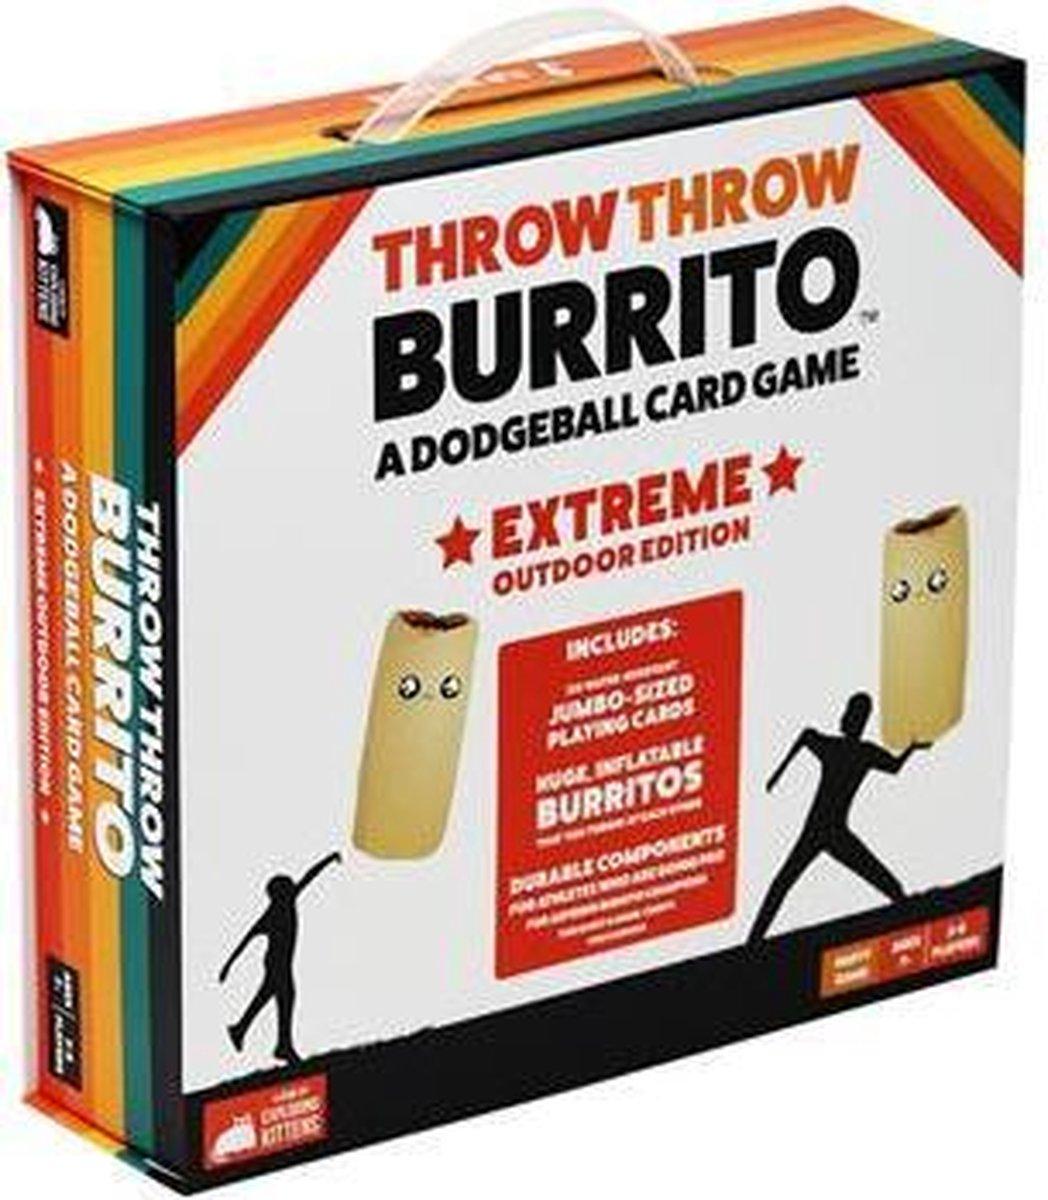 Throw Throw Burrito Extreme Outdoor Edition - Kaartspel